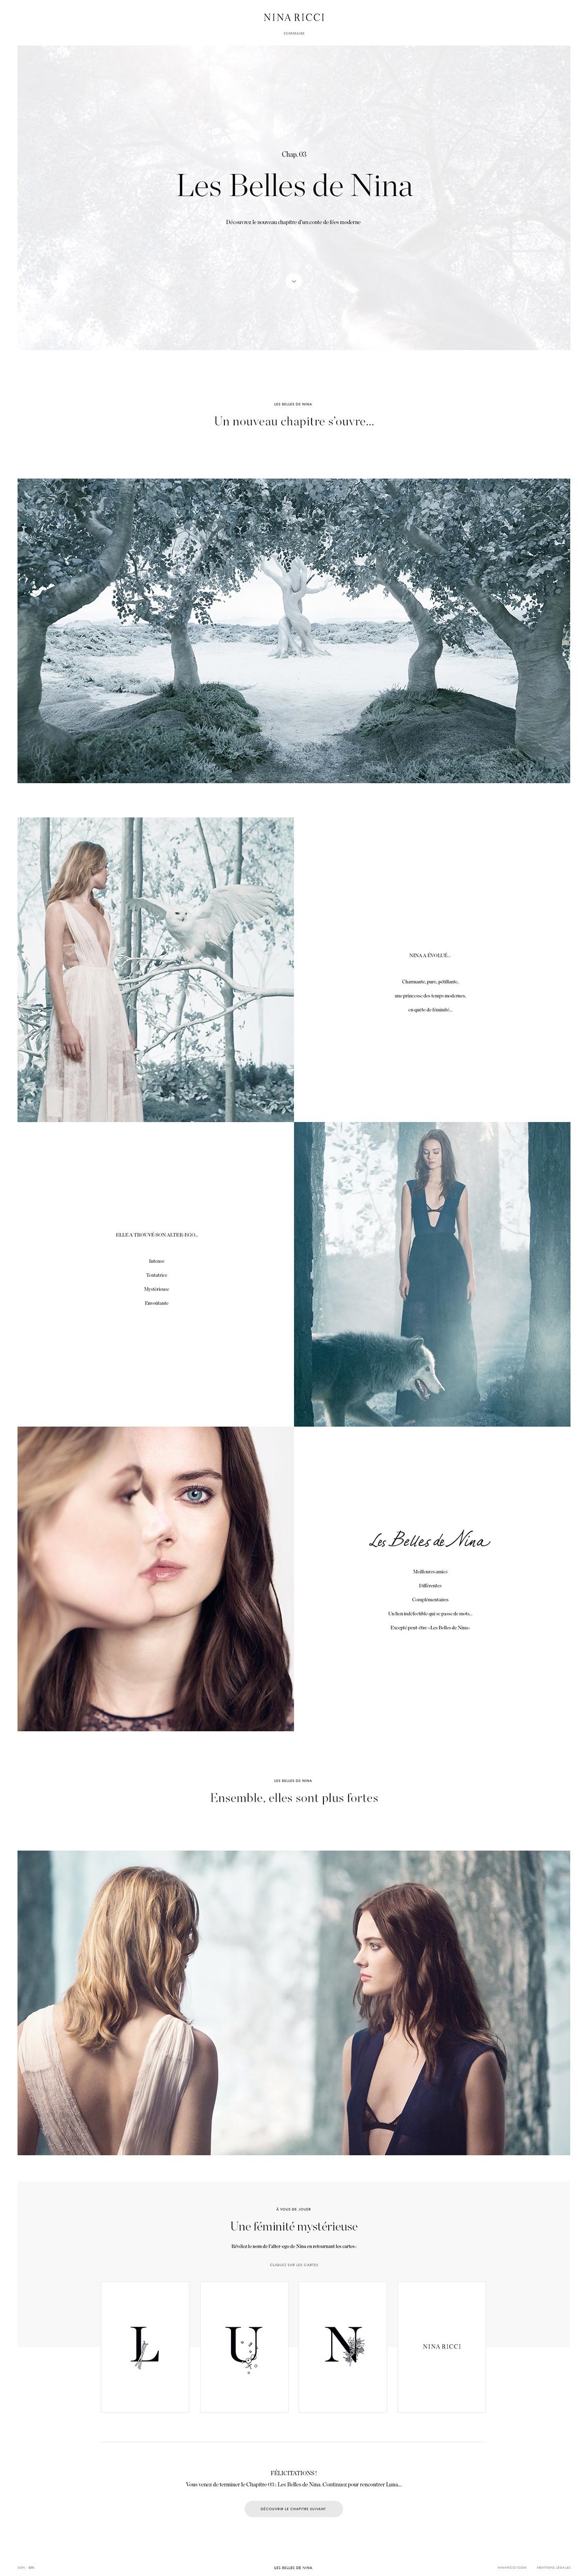 Nina_chapter04